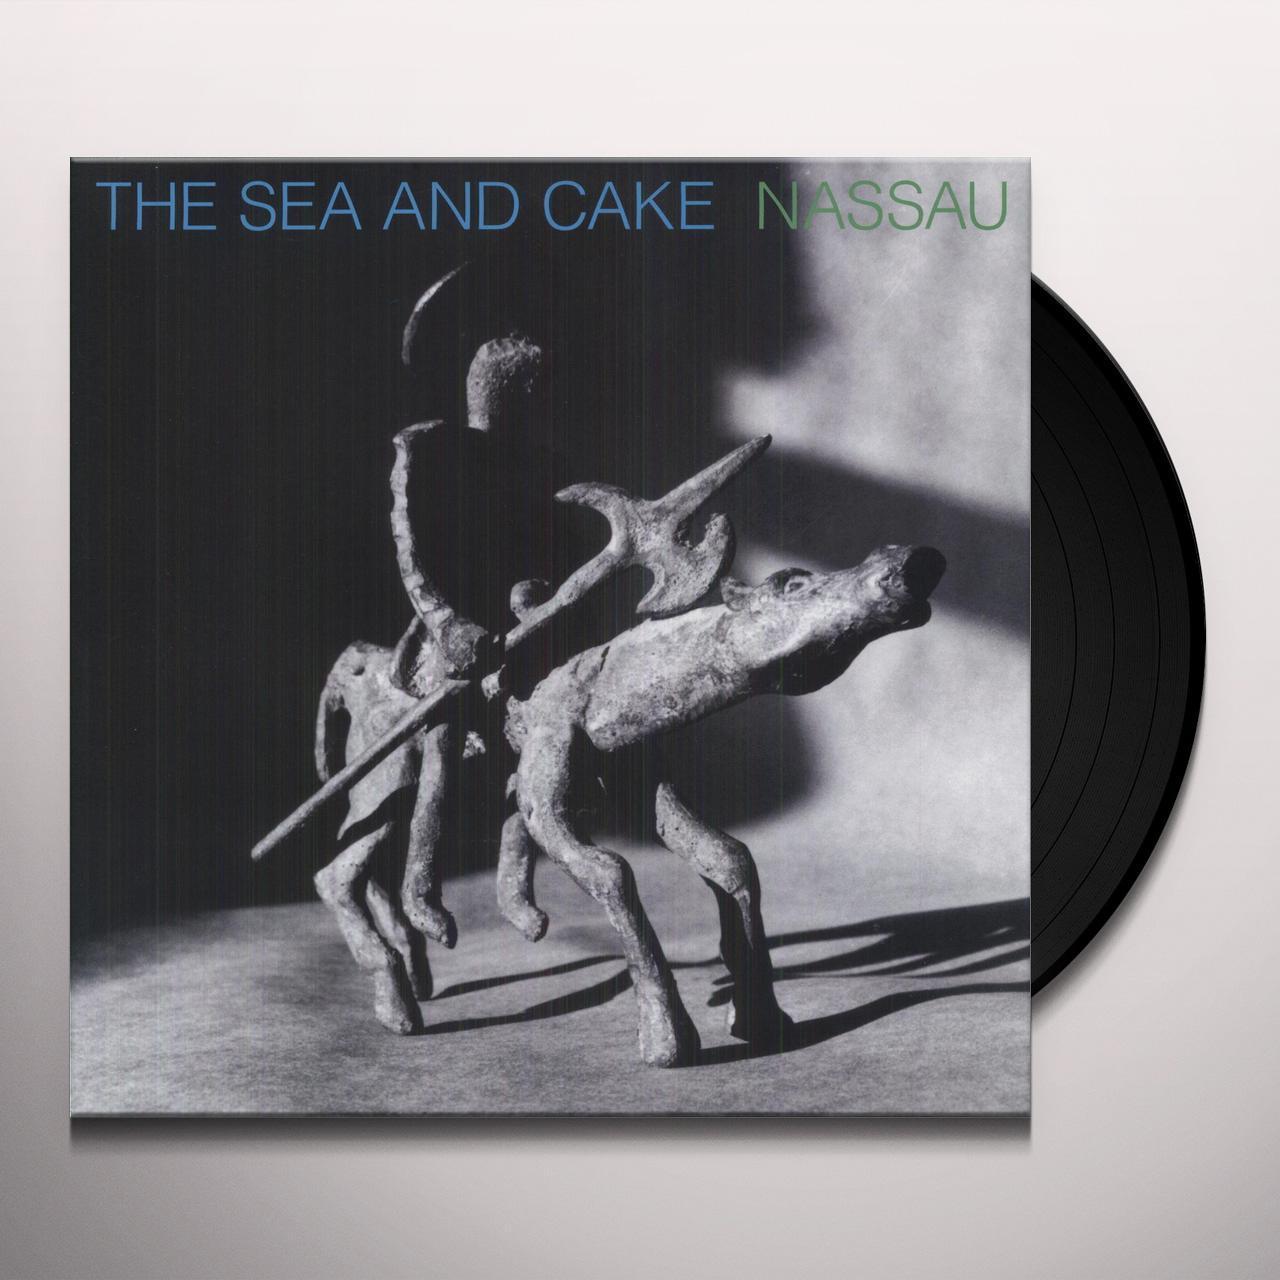 The Sea And Cake Nassau Vinyl Record